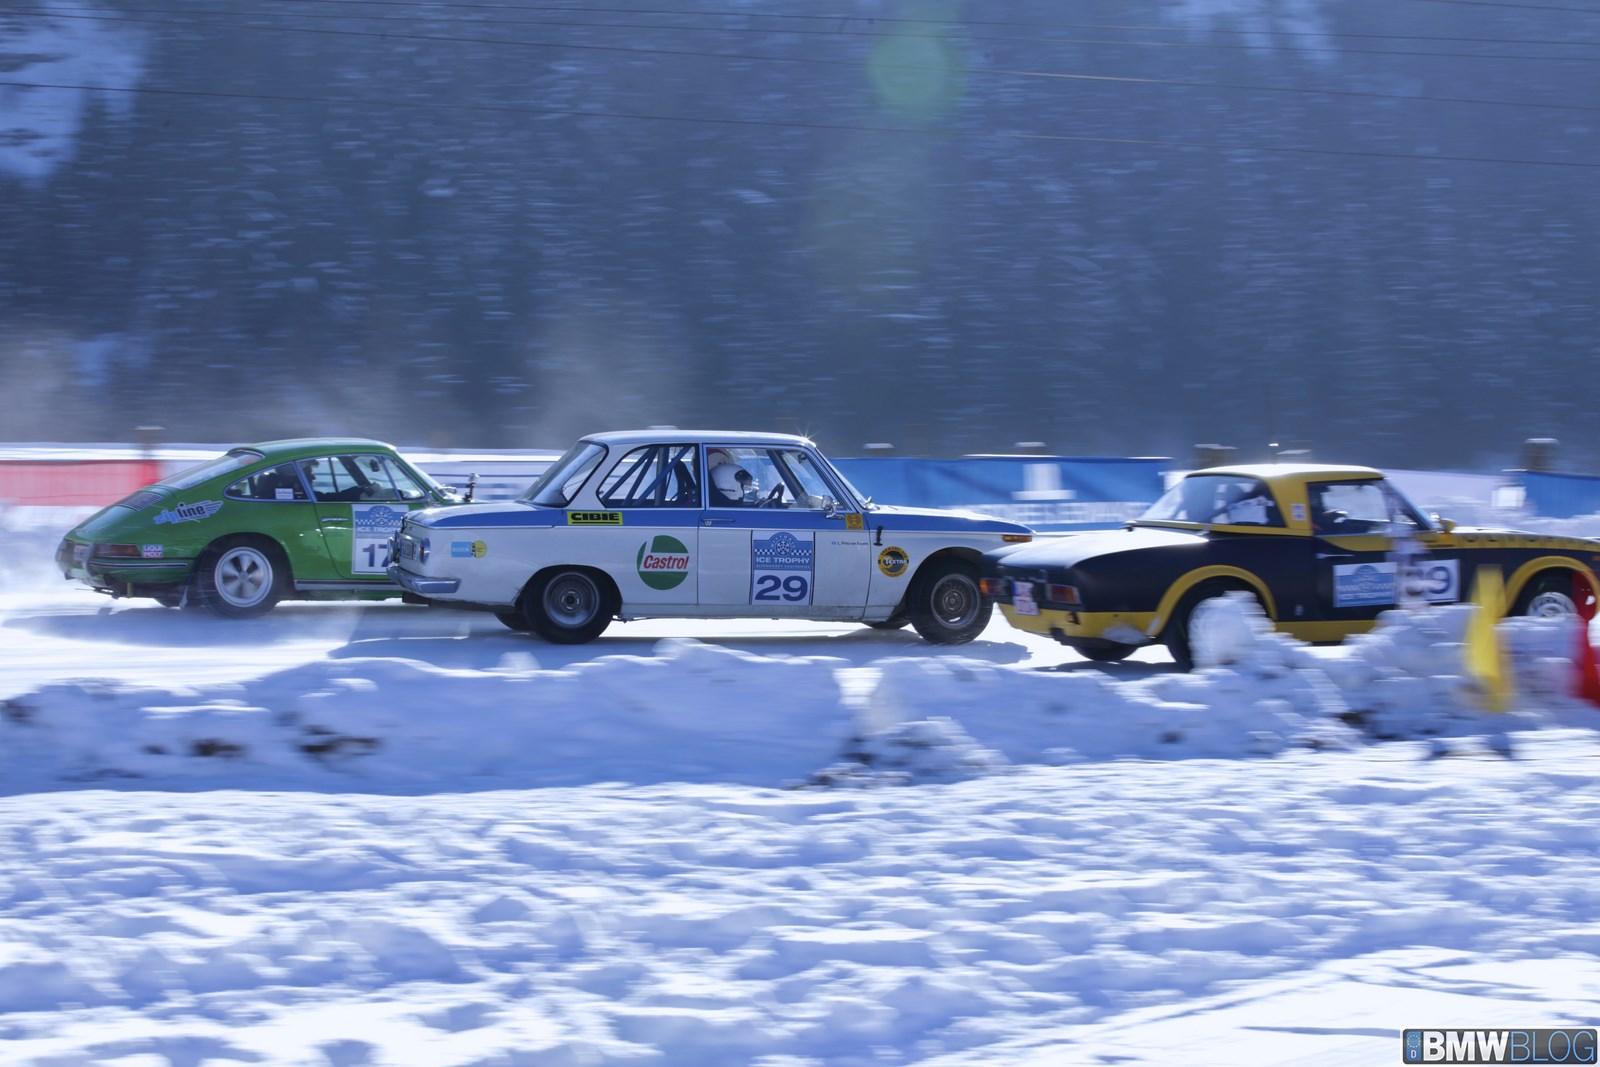 BMW races 2002 TI 19